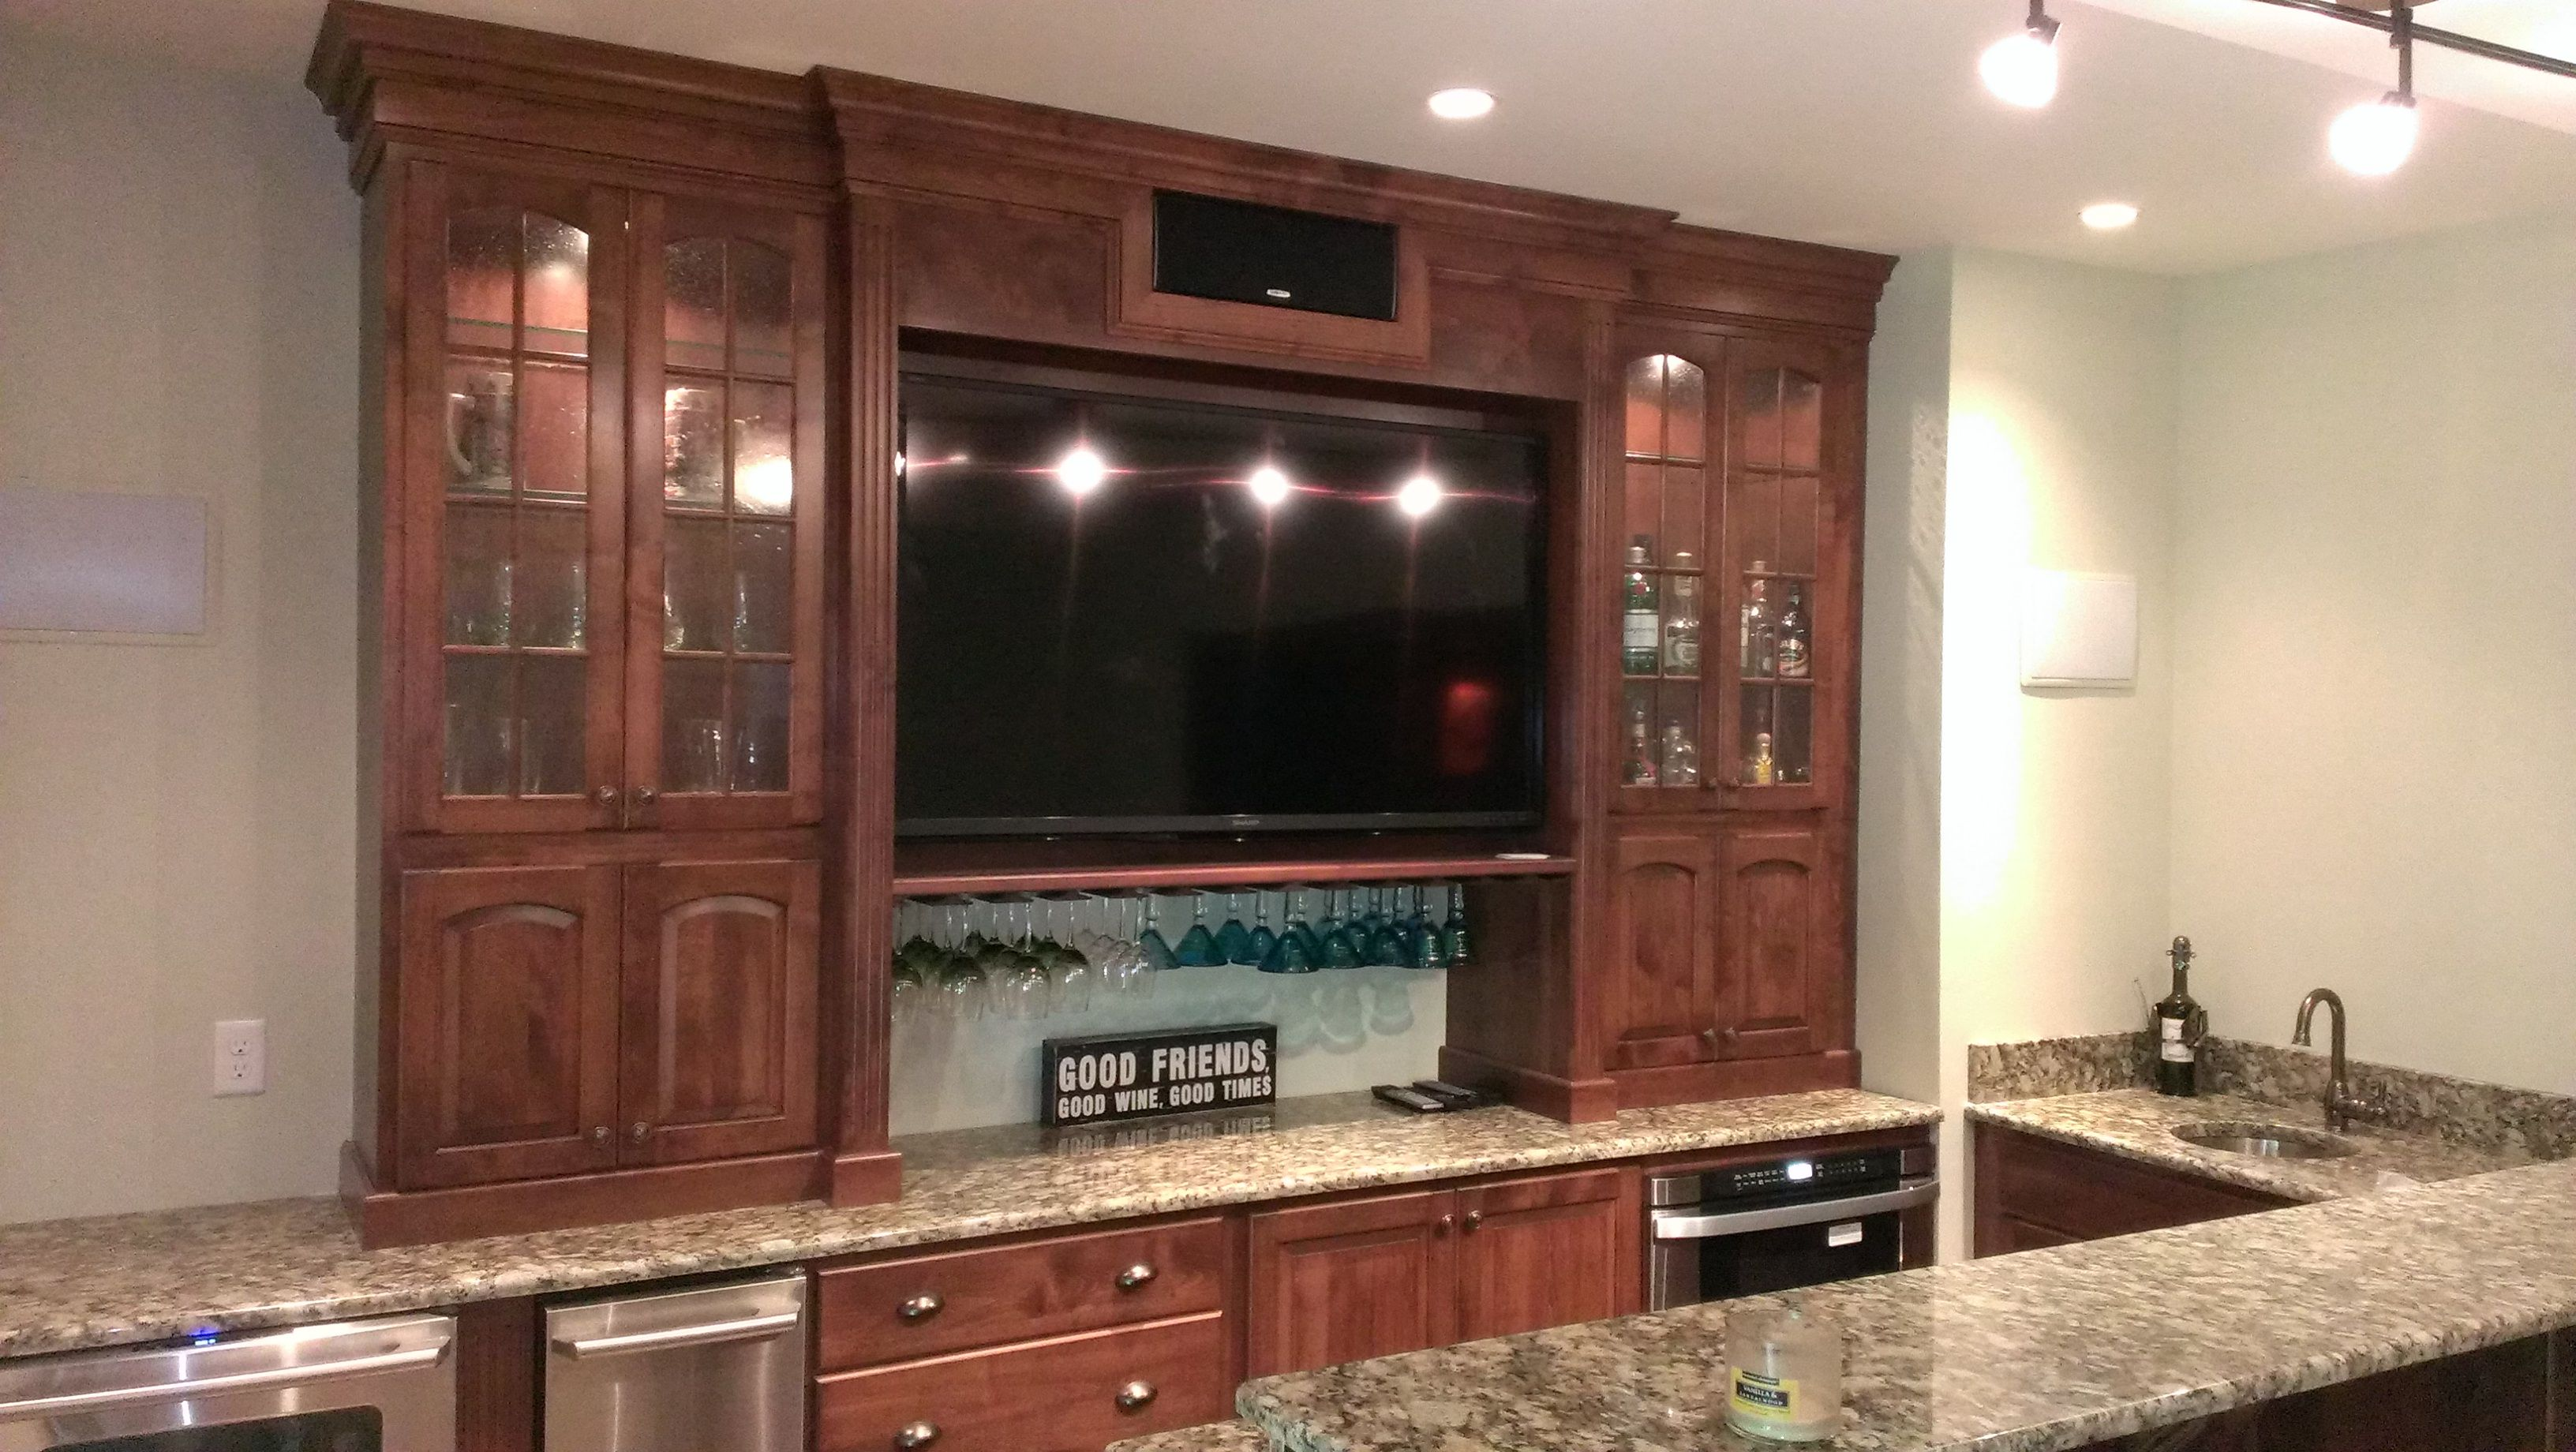 Conestoga Wood Speciality Basement Bar Area Justincabinets Www Justincabinets Com Home Basement Bar Area Home Decor